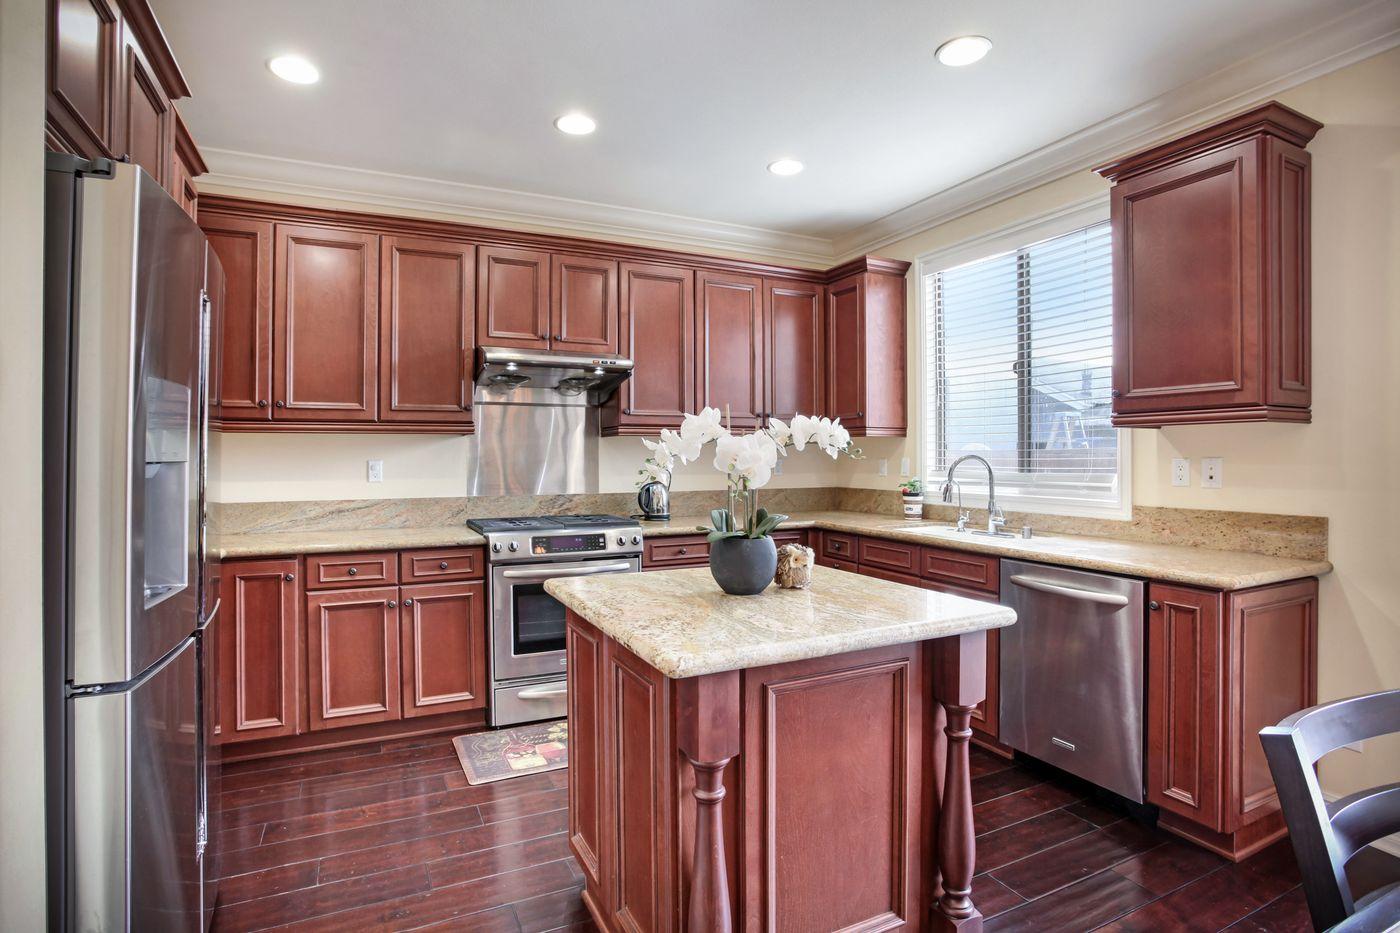 real-estate-photography-los-angeles-pasadena-glendale-burbank-5015 Farago Ave-Temple City-photographer-5